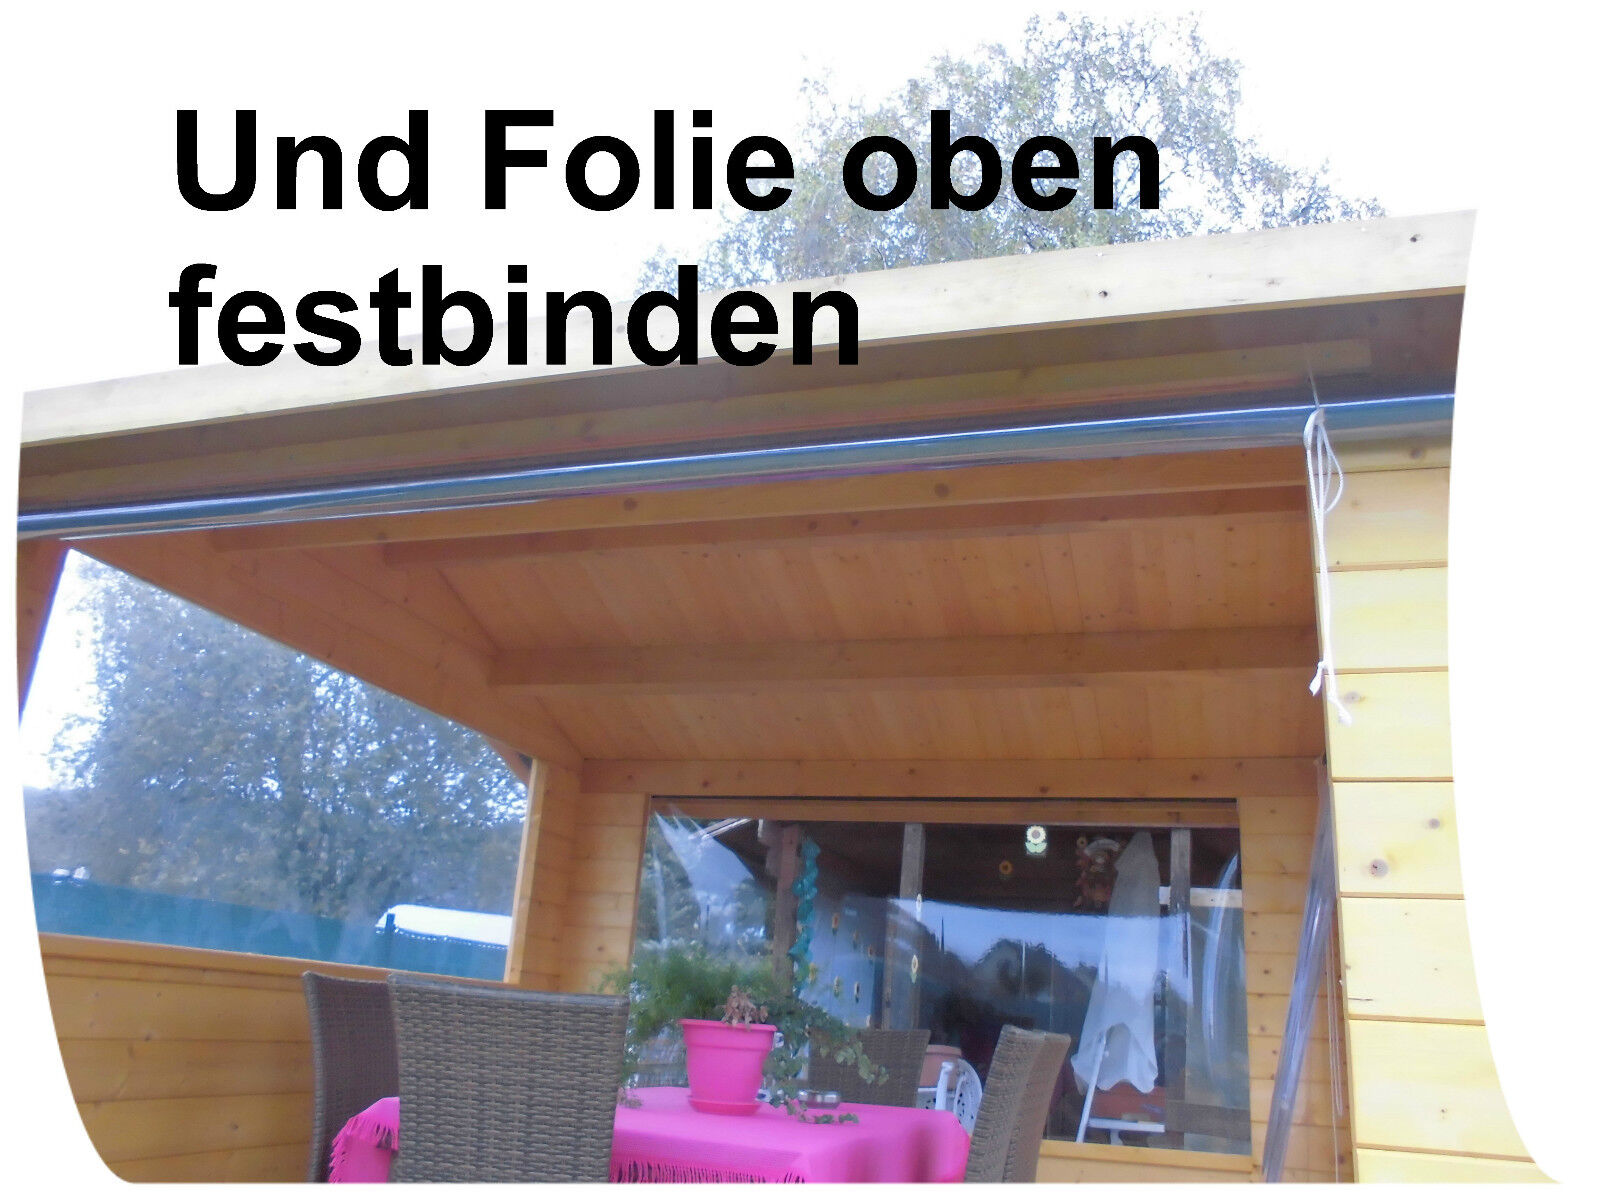 klarsichtfolie 13 50 m transparente pvc folie durchsichtige folie 1 mm stark eur 6 75. Black Bedroom Furniture Sets. Home Design Ideas